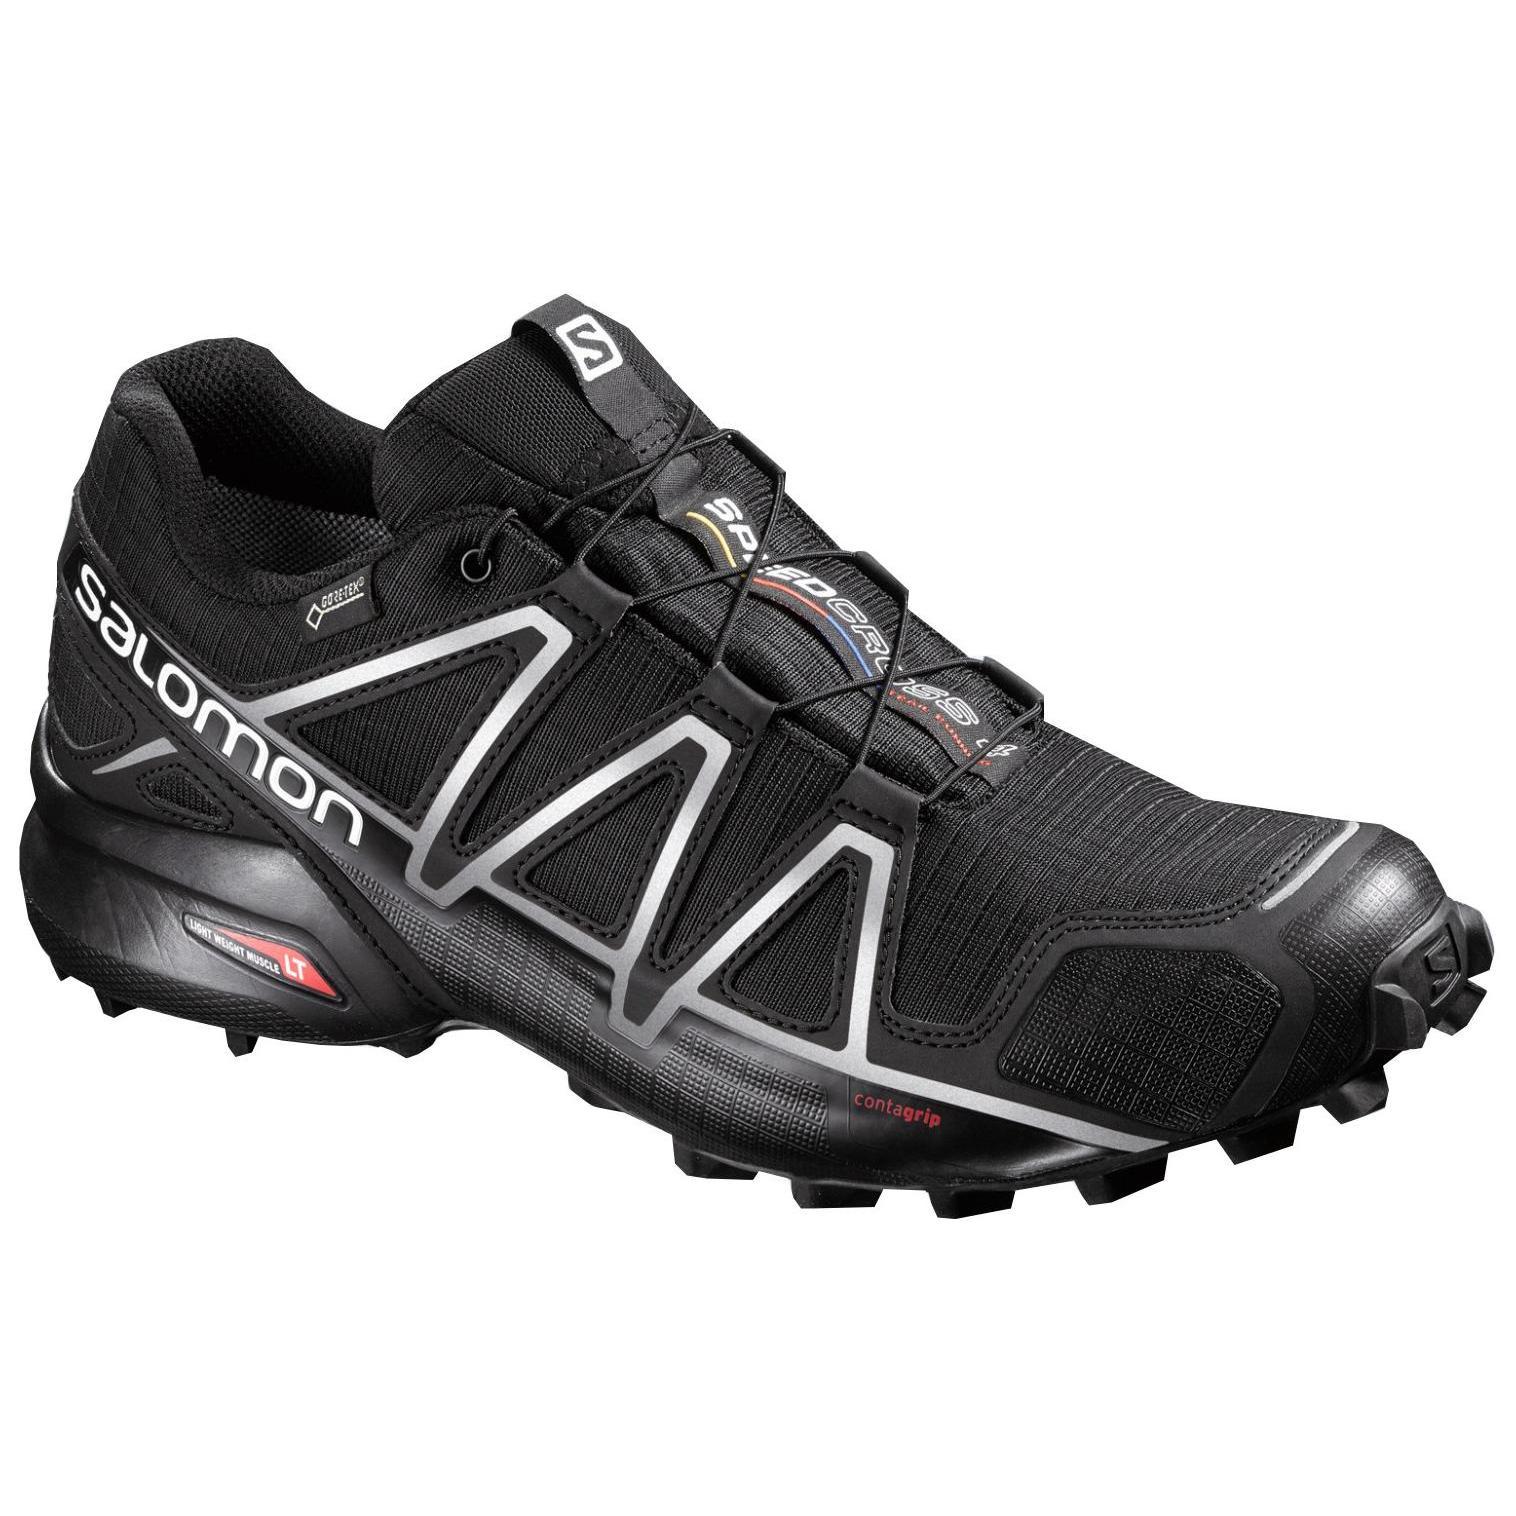 3ed68b44 Беговые кроссовки для XC Salomon 2018-19 SPEEDCROSS 4 GTX® Black ...